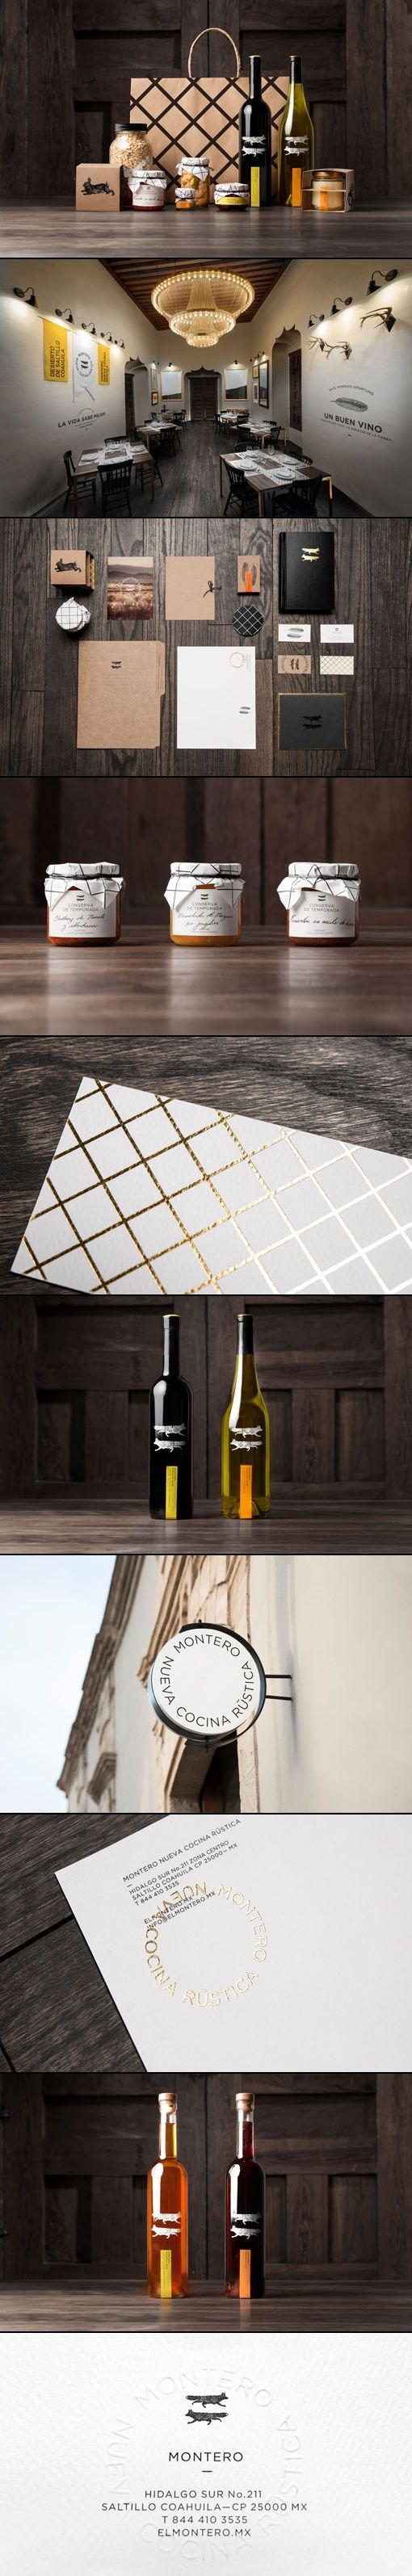 Montero | Anagrama #branding #identity #packaging PD